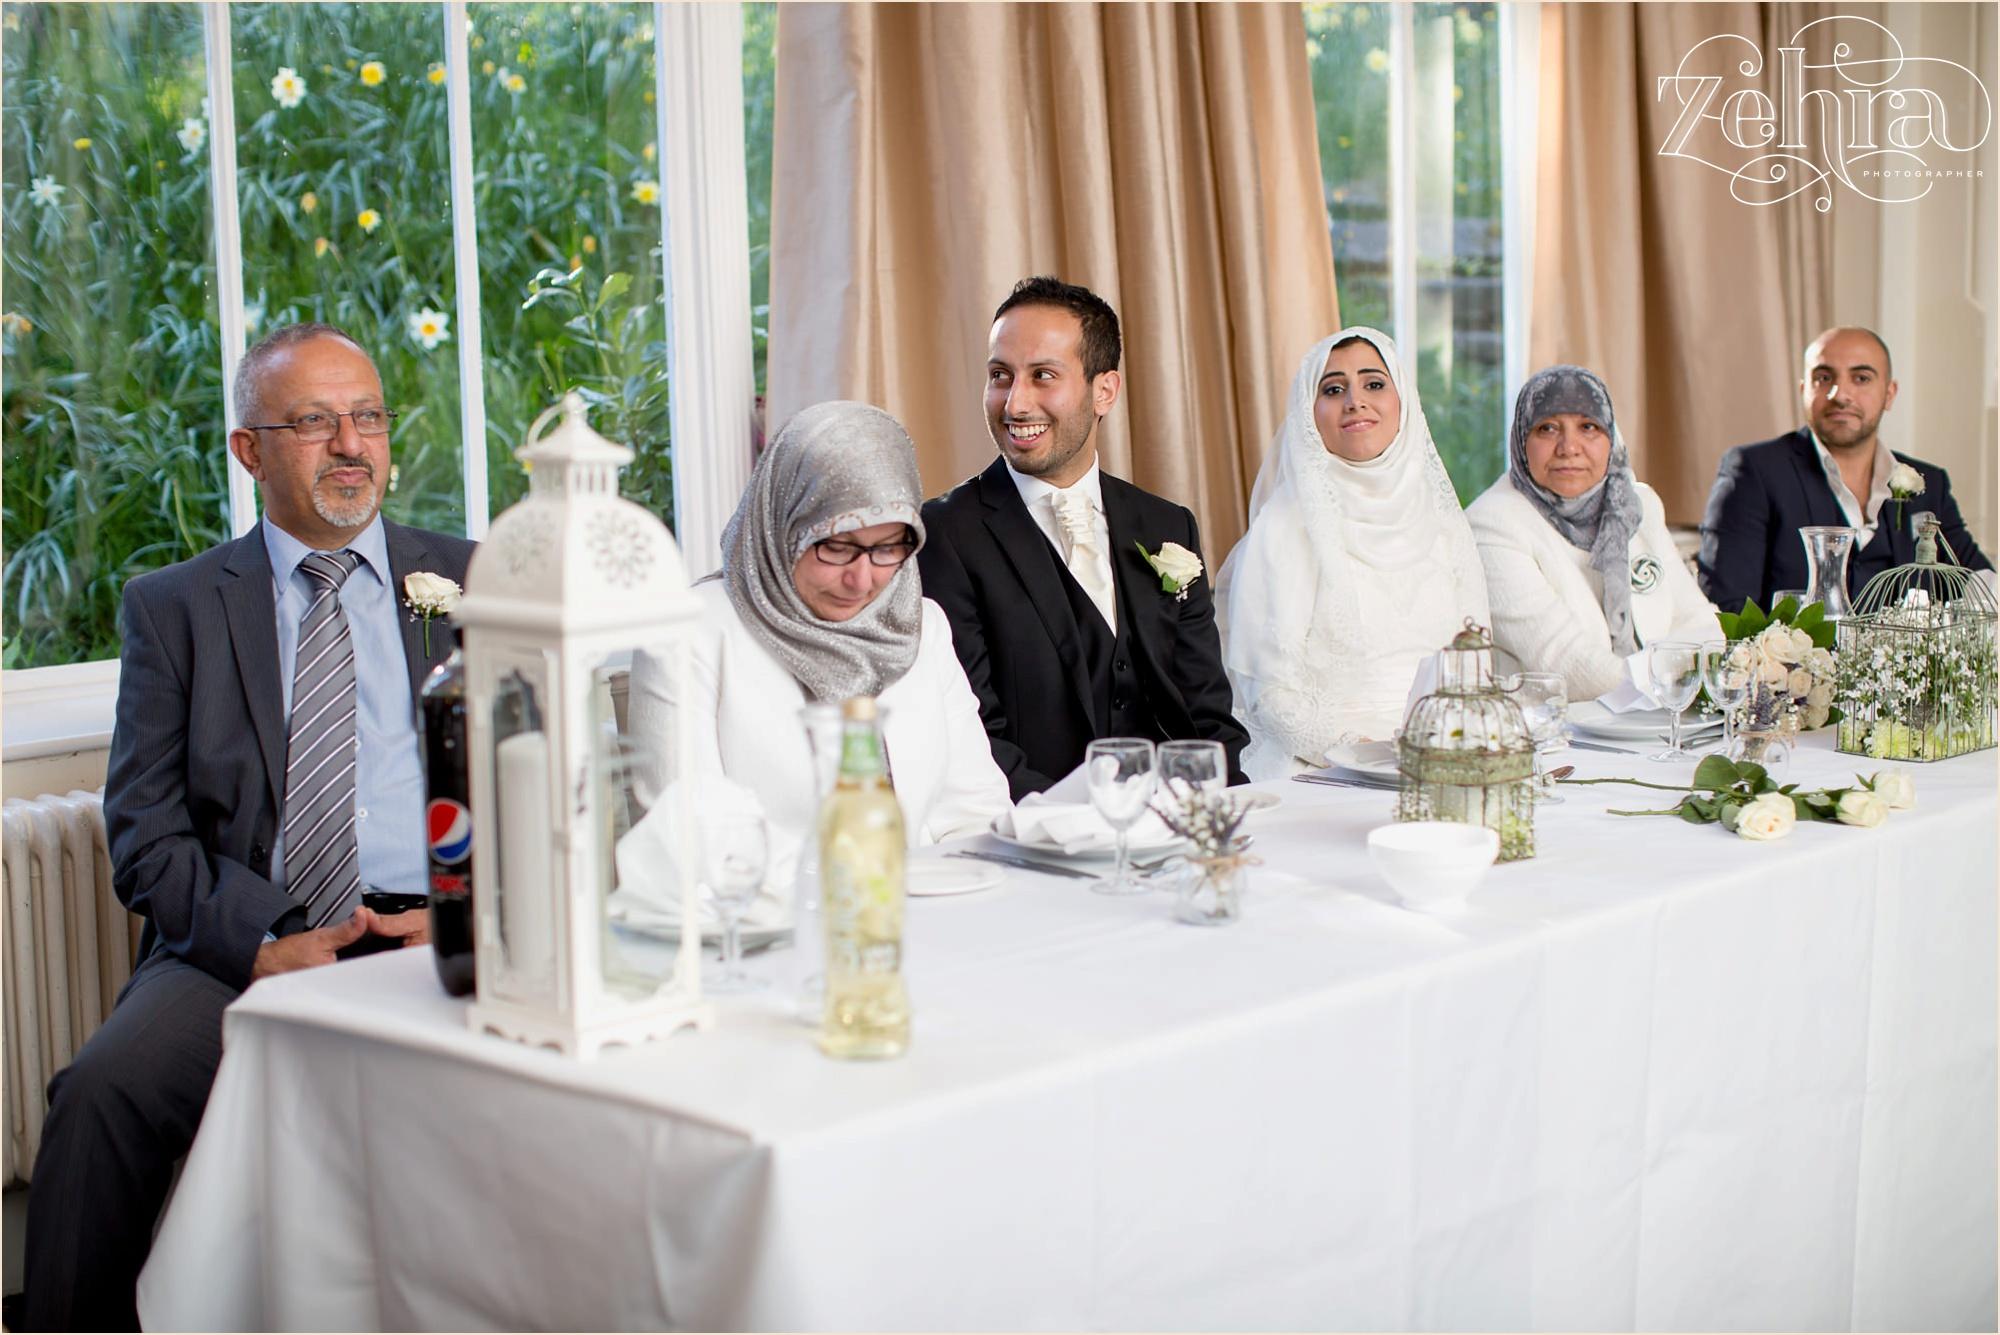 jasira manchester wedding photographer_0107.jpg